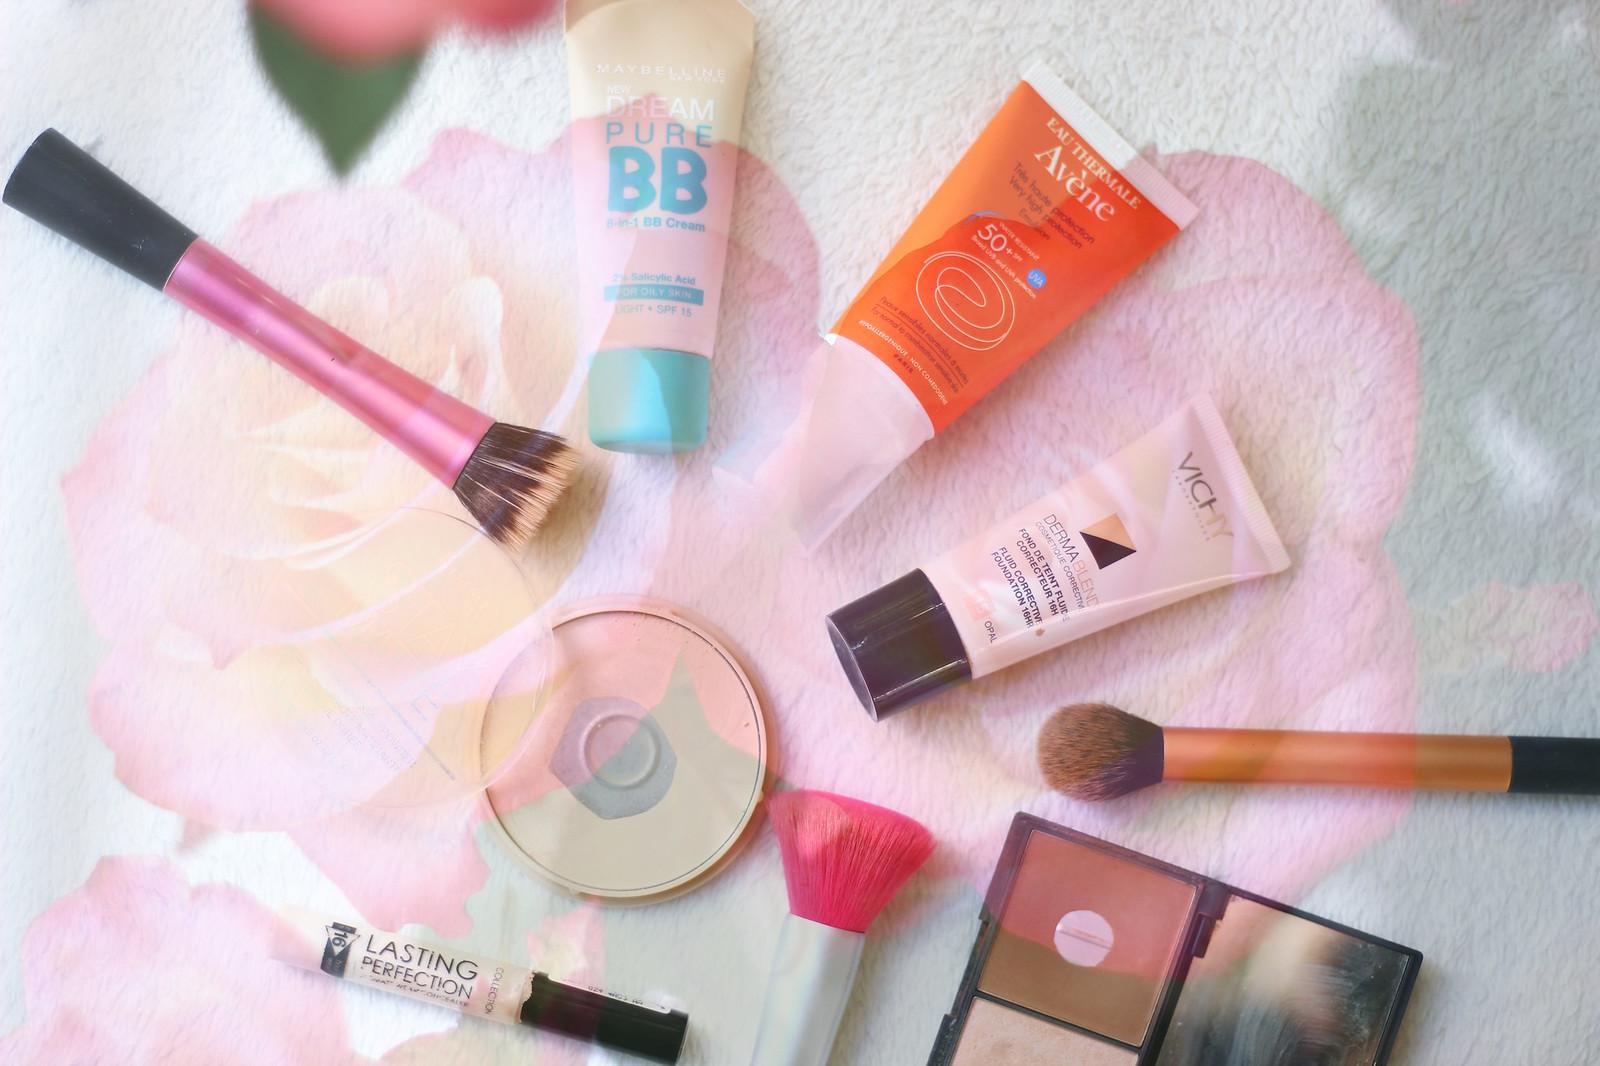 IMG_7857 layered, make up, everyday, beauty, products, avene, skincare, high street